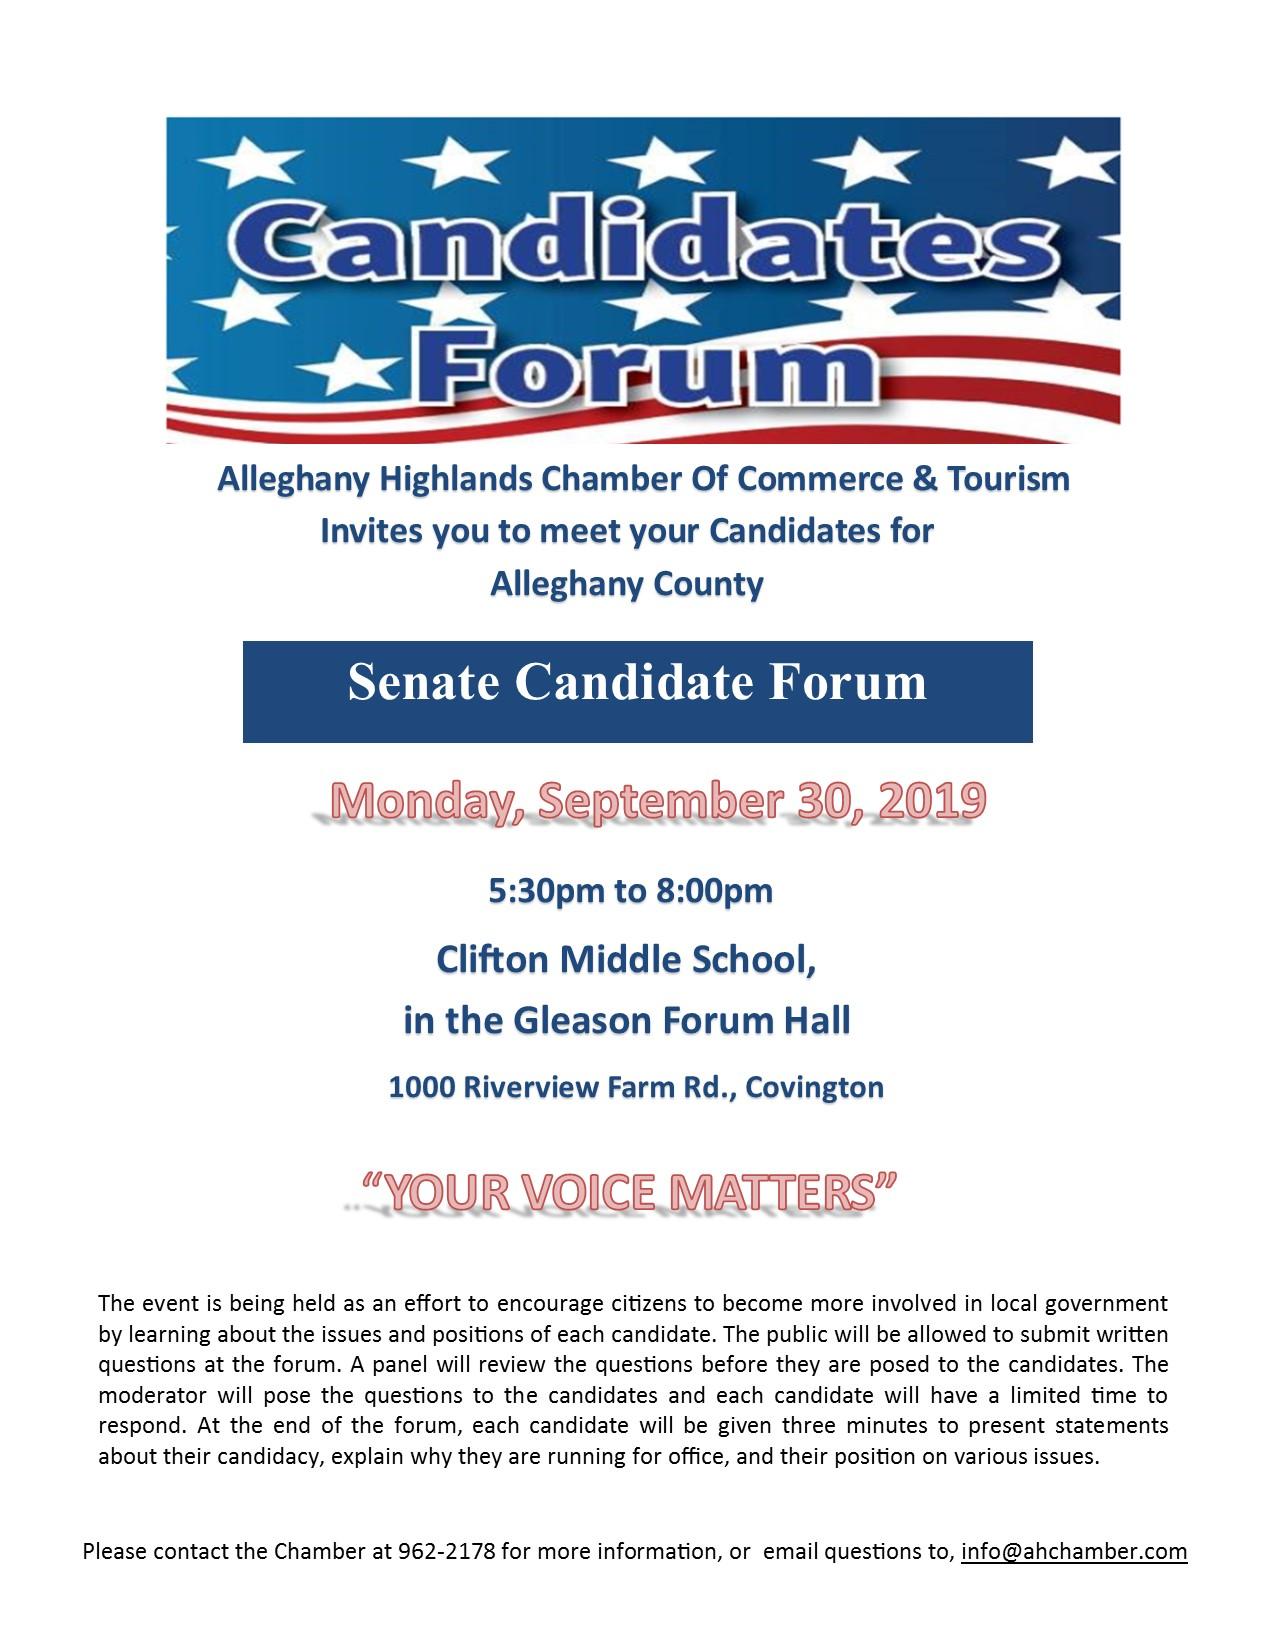 2019-Senate Candidate Forum-Flyer.pub Alleghany County